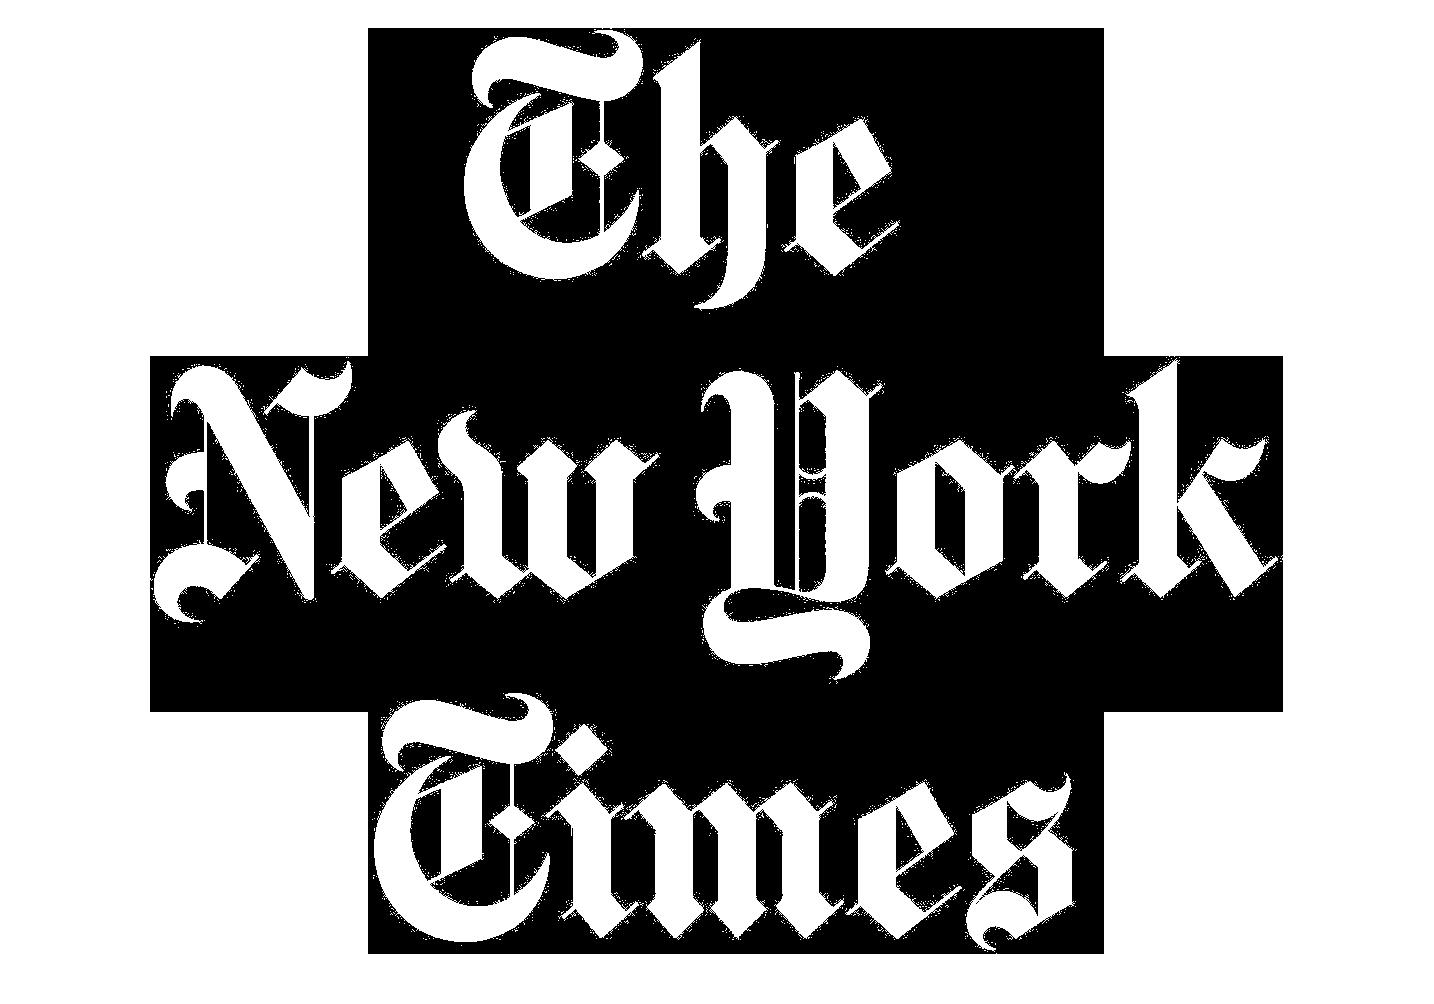 New_York_Times_logo_variation2